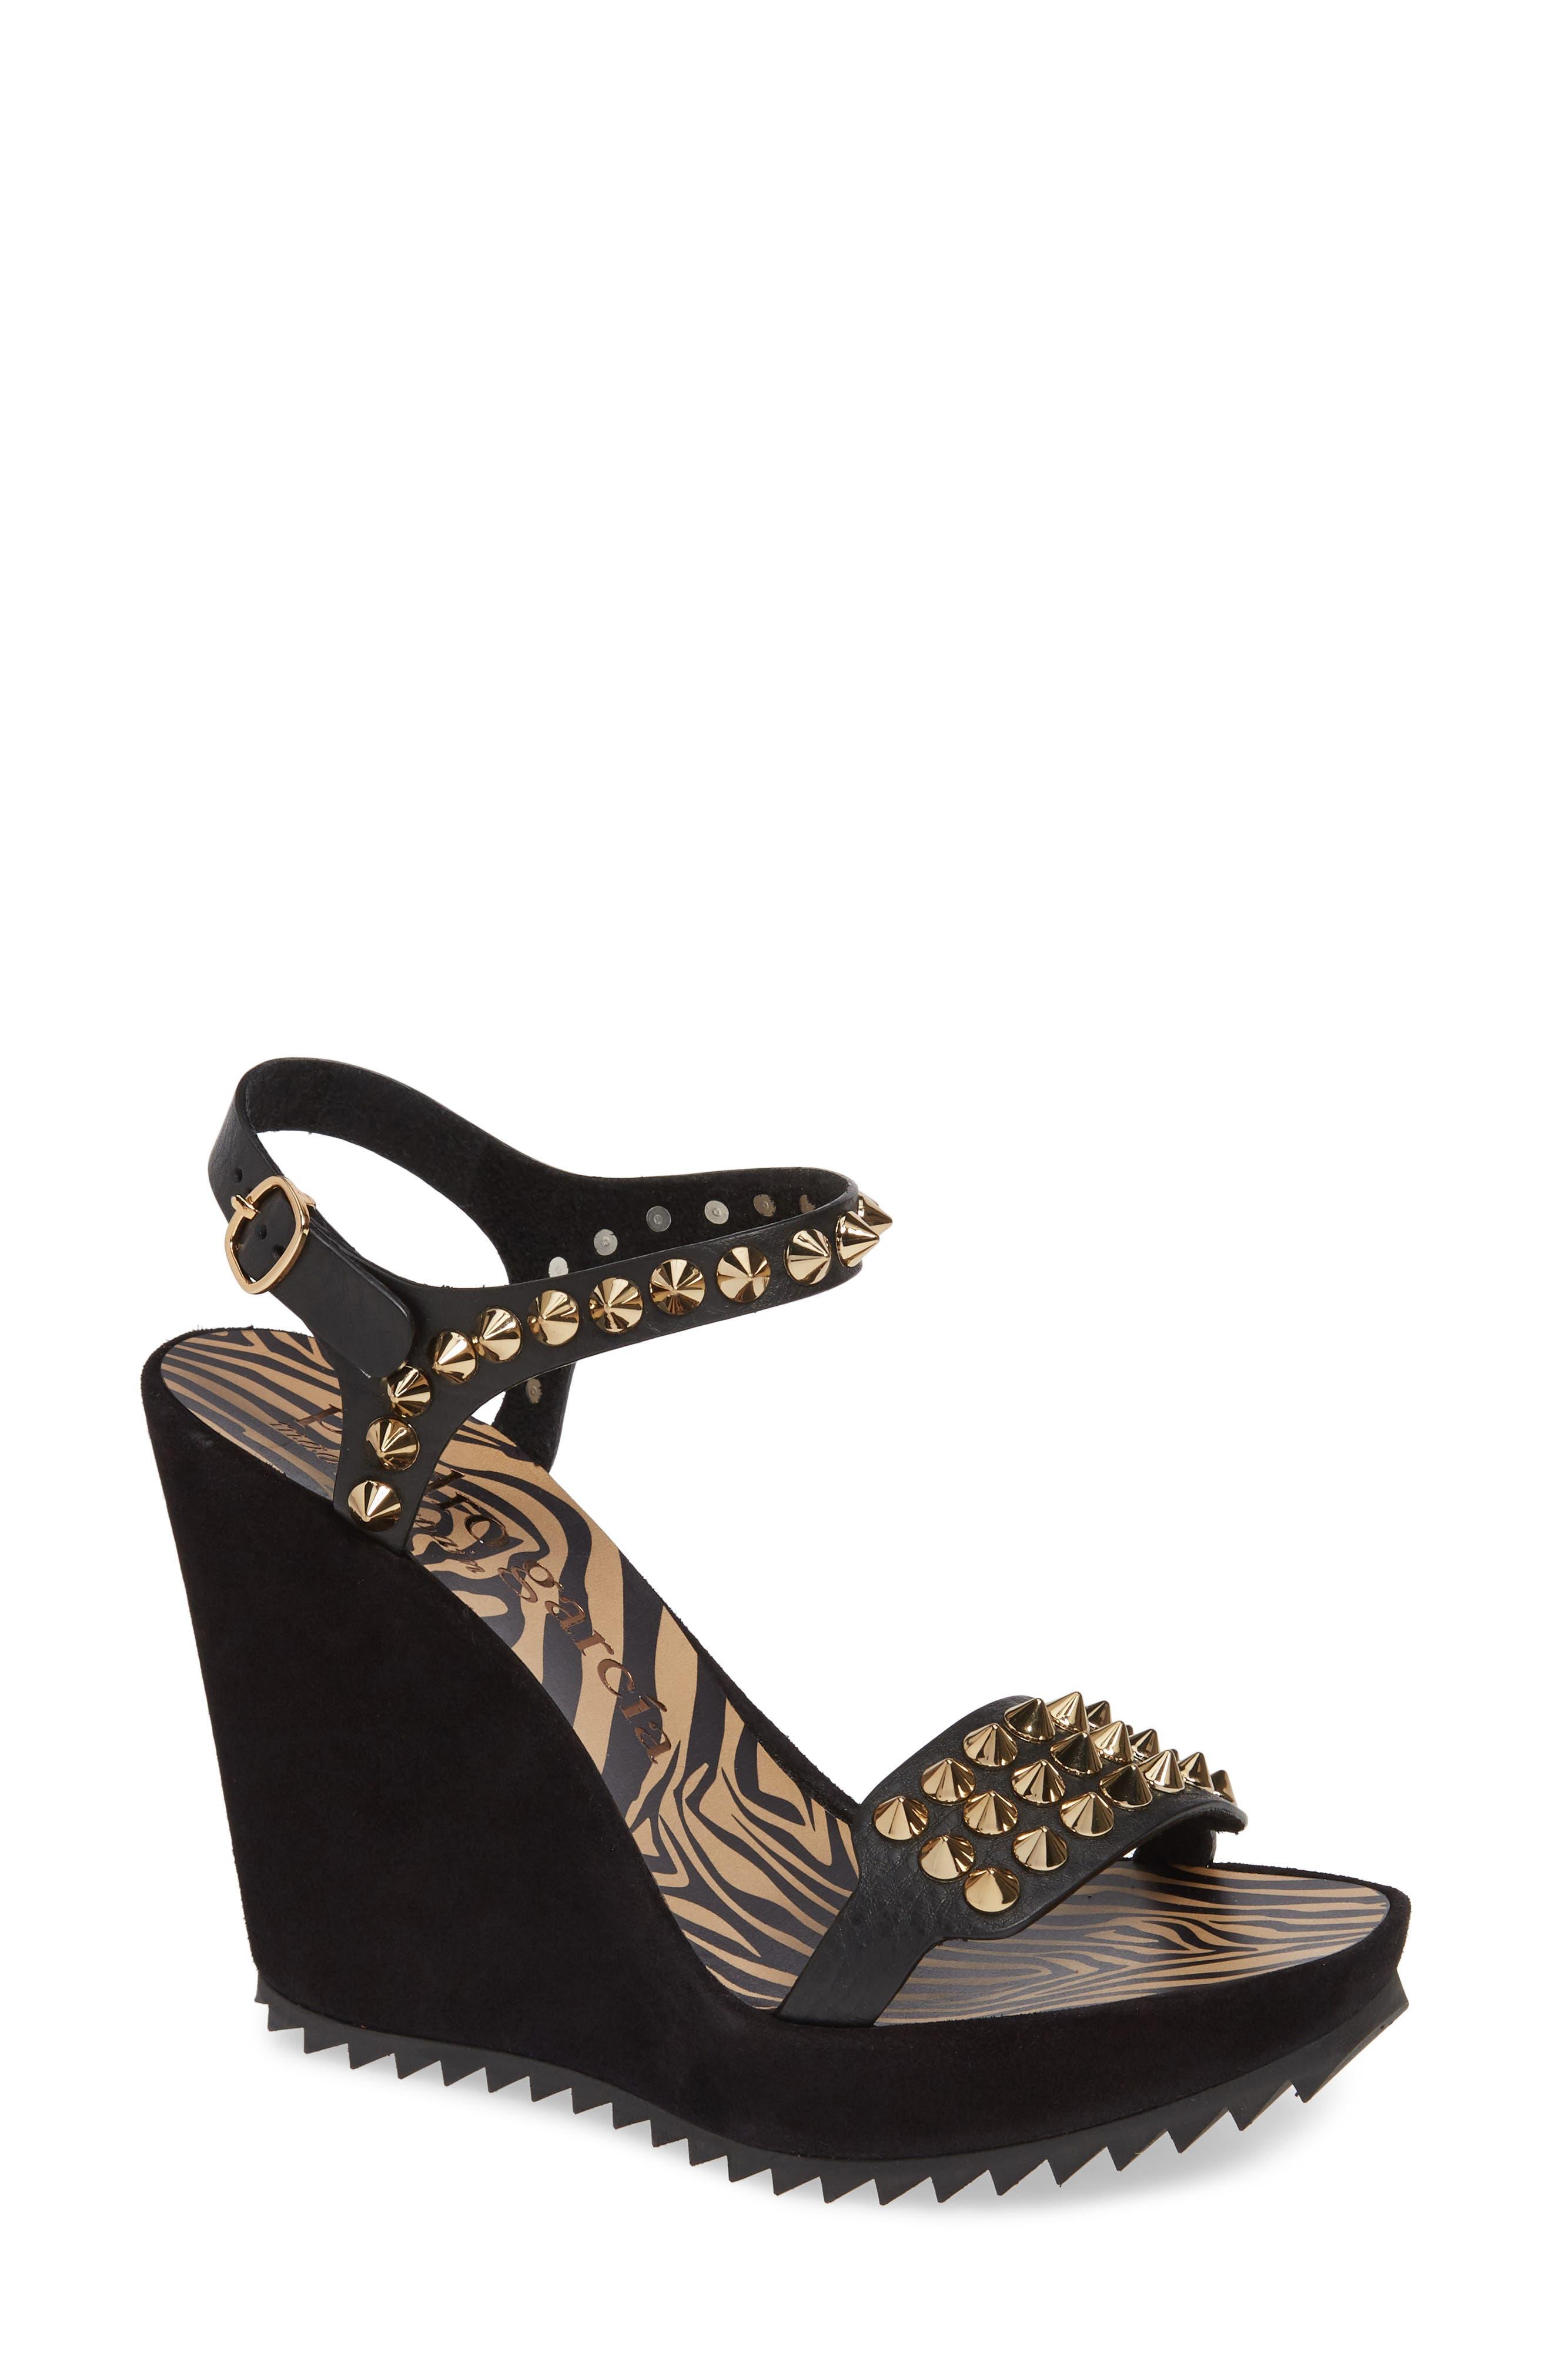 PEDRO GARCIA, Voka Studded Wedge Sandal, Main thumbnail 1, color, BLACK SUEDE